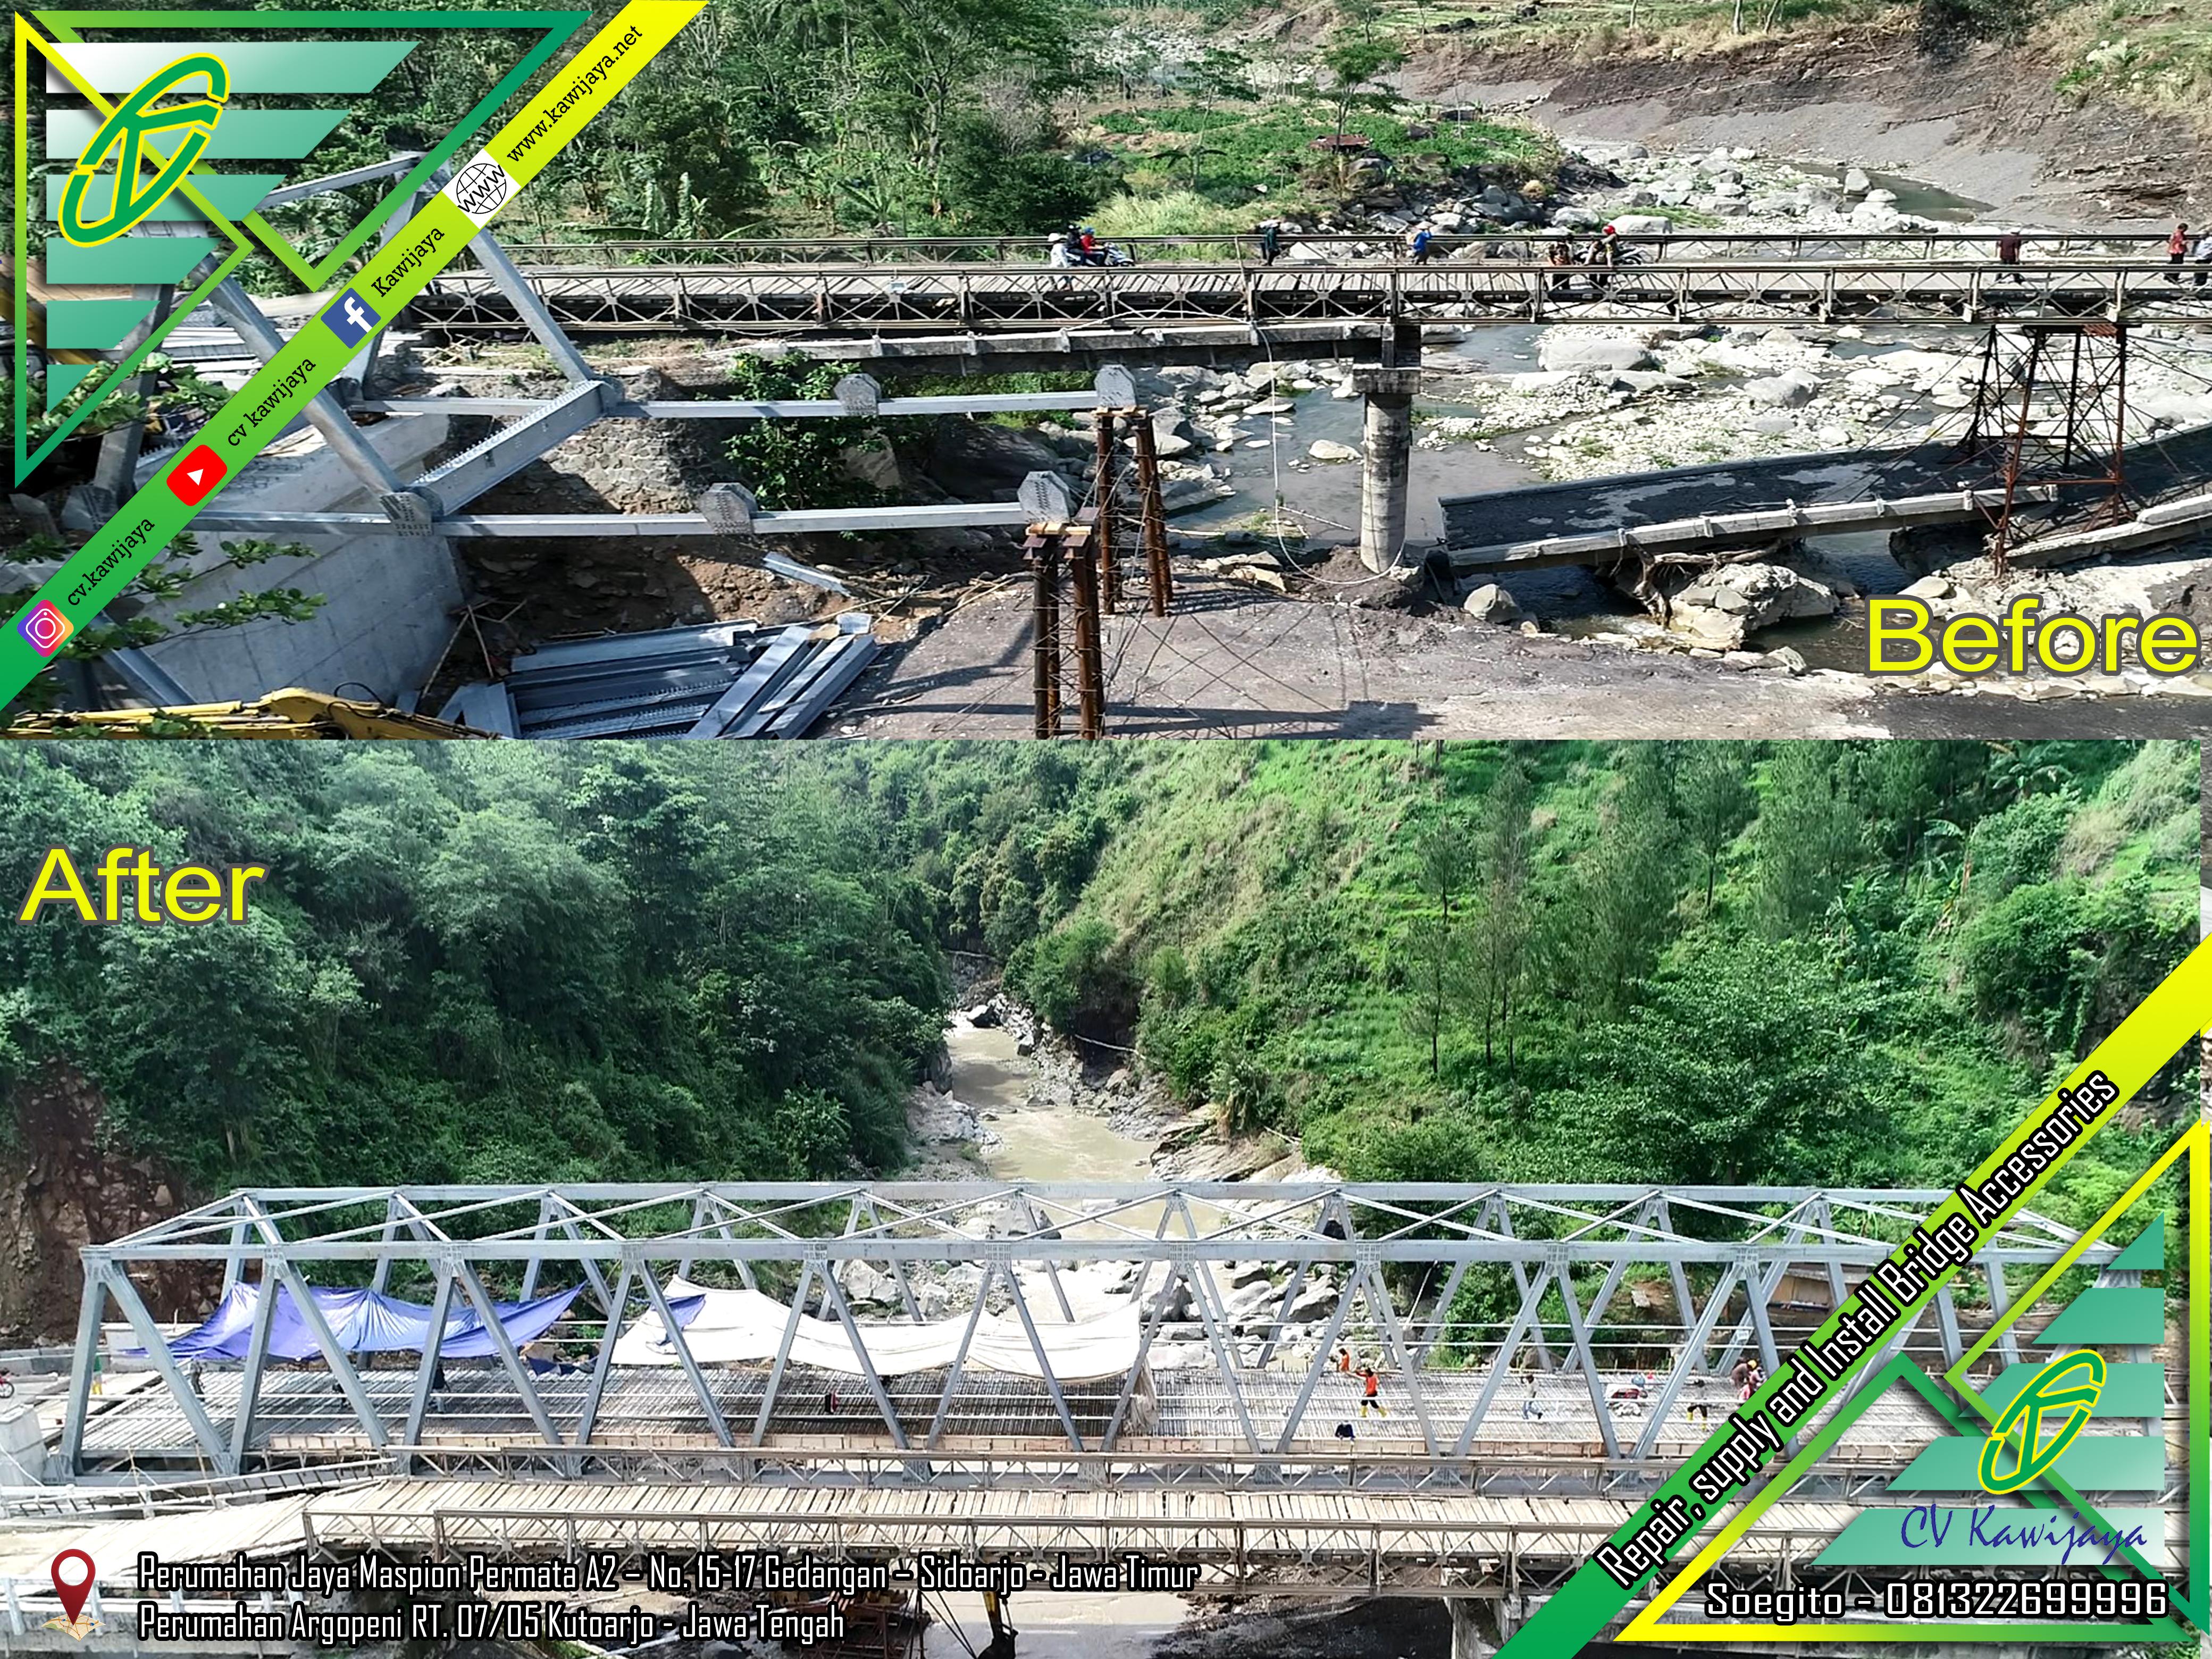 Erection Jembatan Rangka Pemalang (B-60)